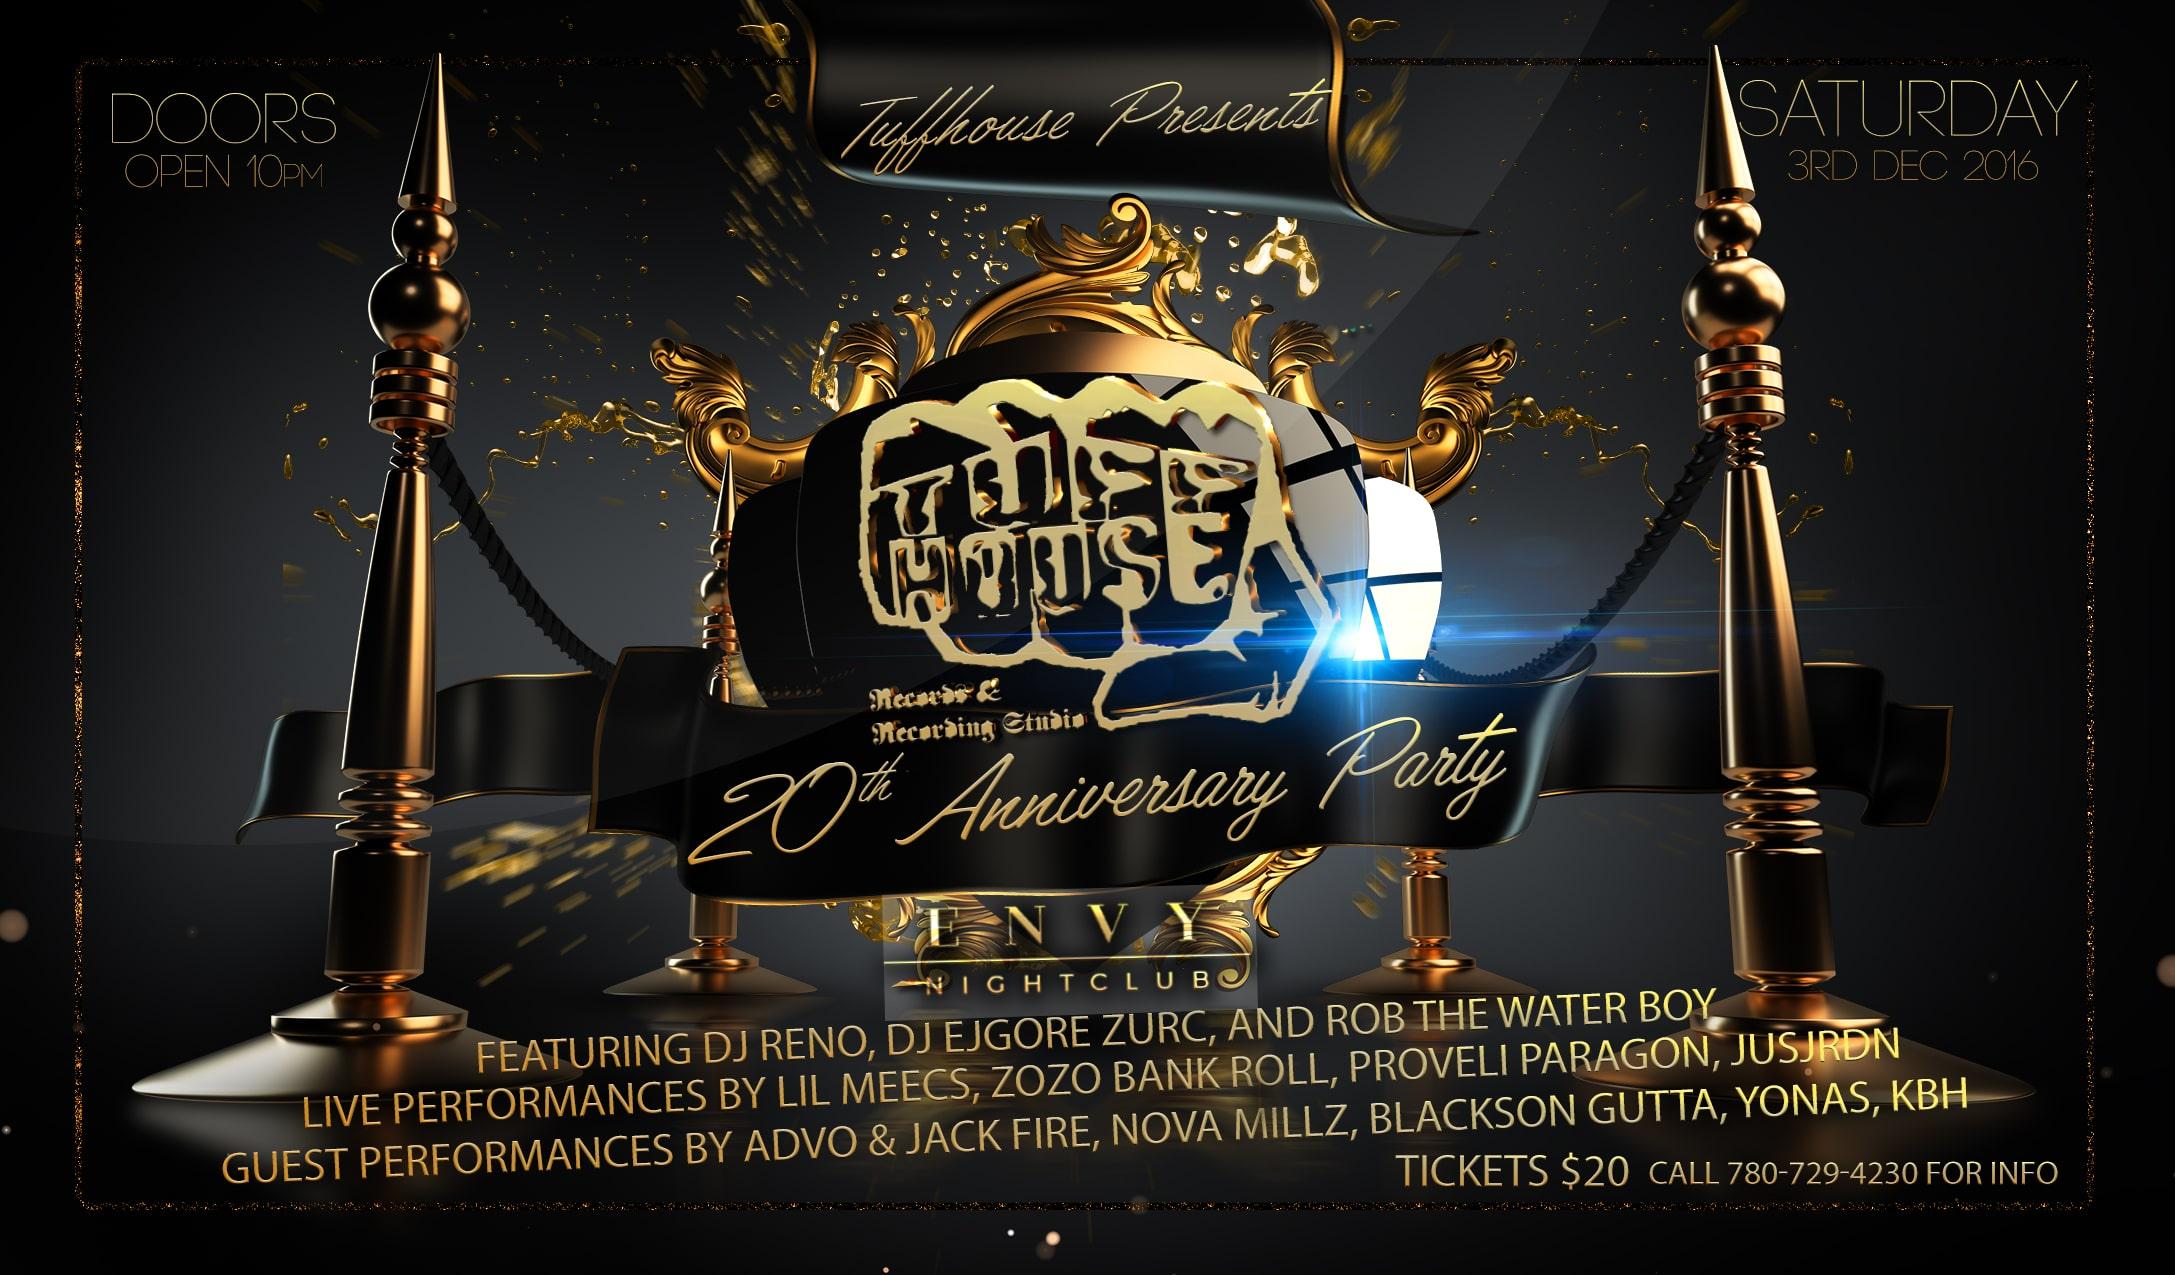 tuffhouse-anniversary